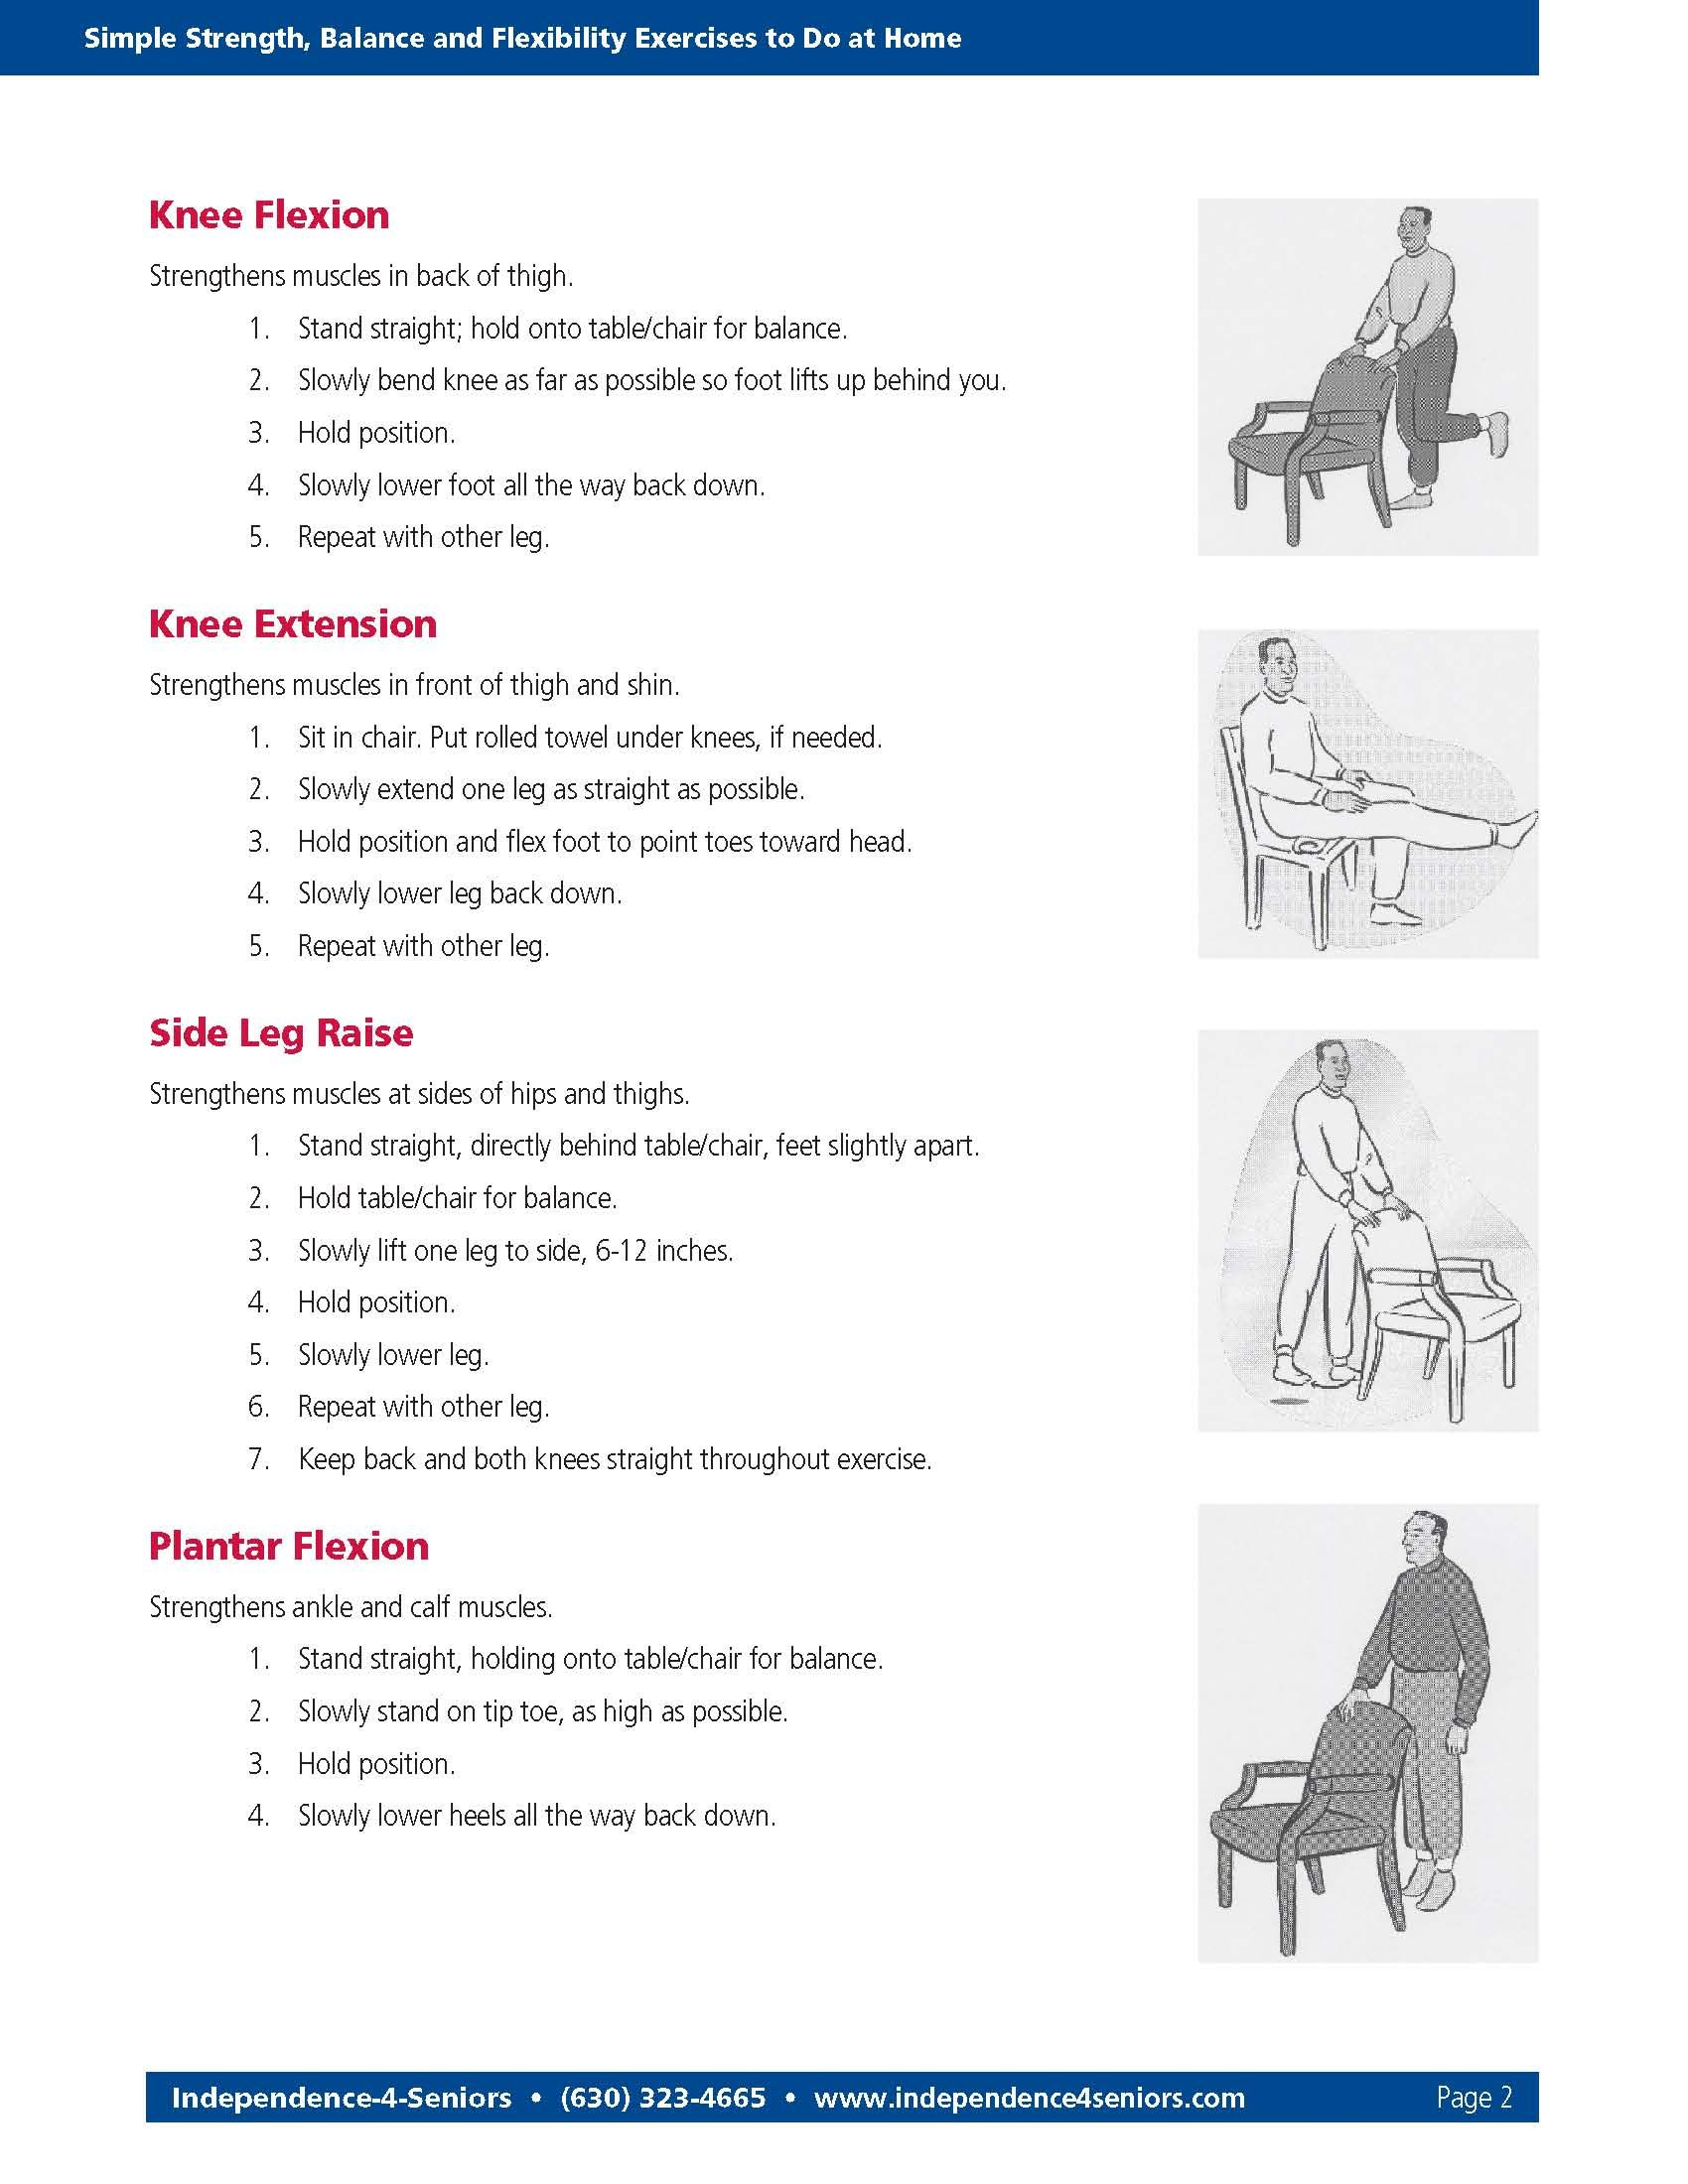 balance exercises for elderly pdf